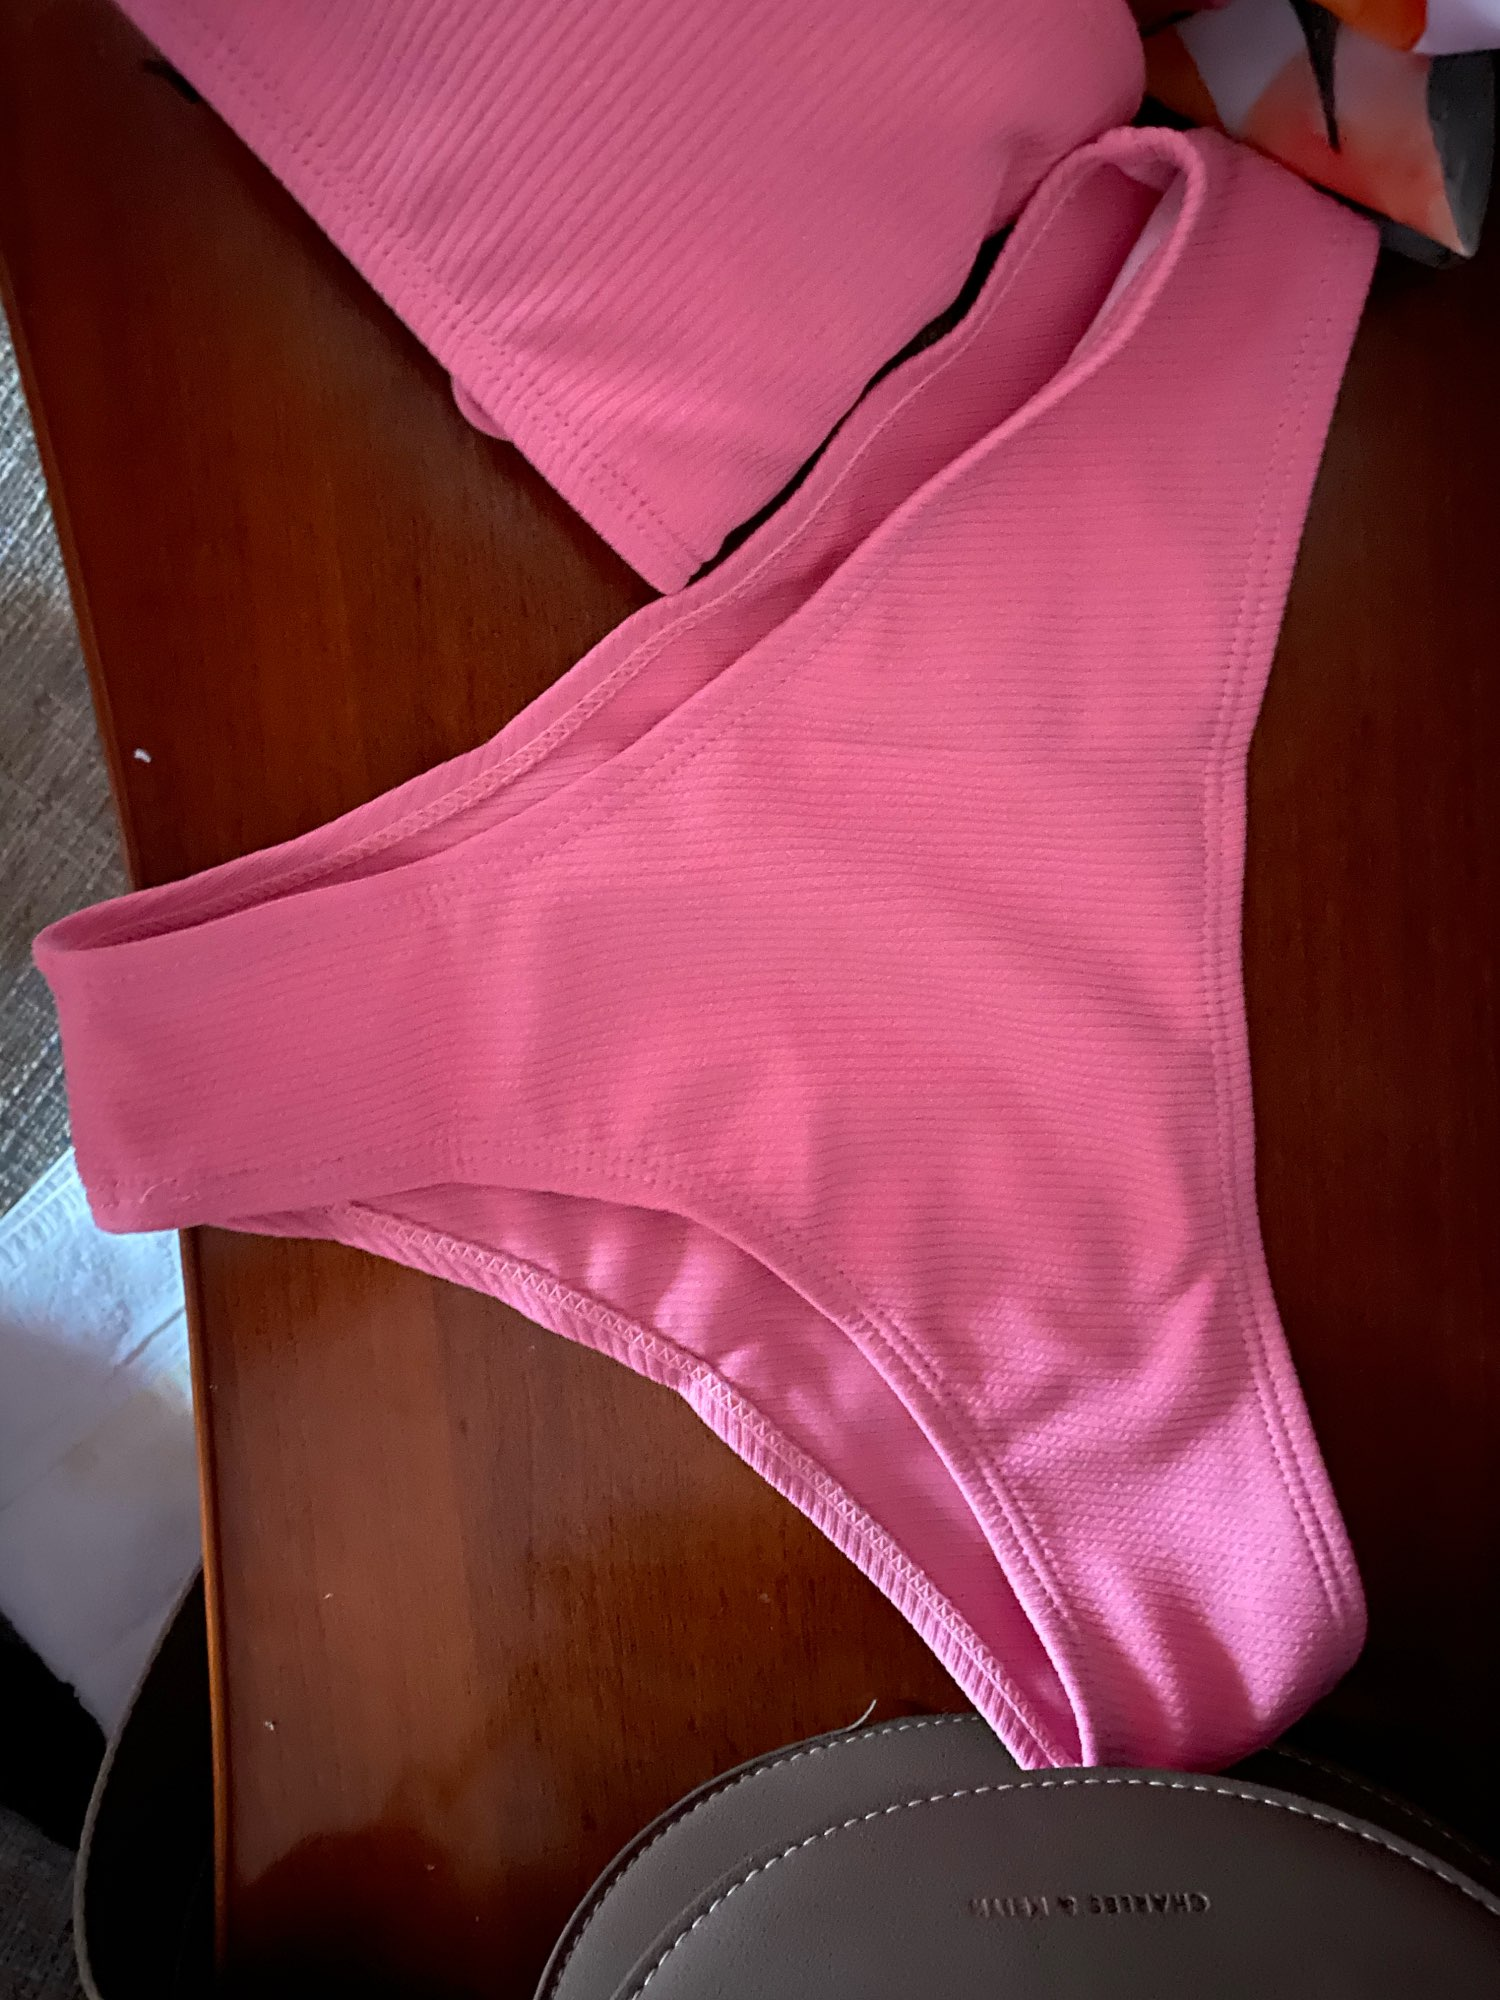 2020 New Bikini Women Swimwear High Waist Strapless Sexy Bikini Pure Color Women Swimsuit Padded Bathing Suit Monokin|Bikini Set|   - AliExpress